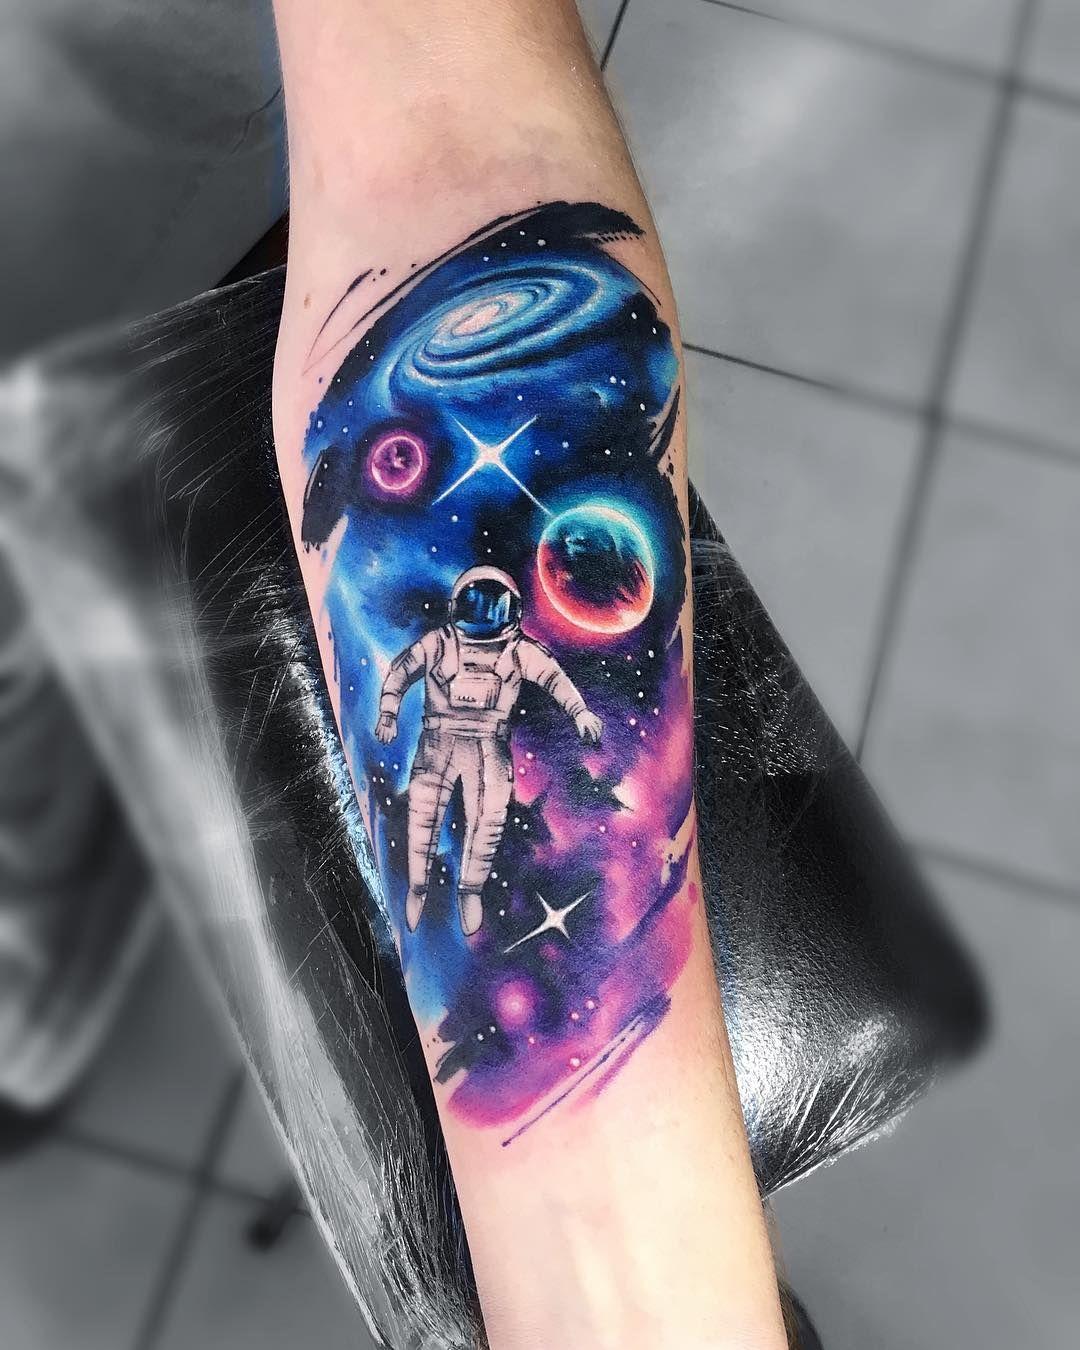 Astronaut in space tattoo ideas